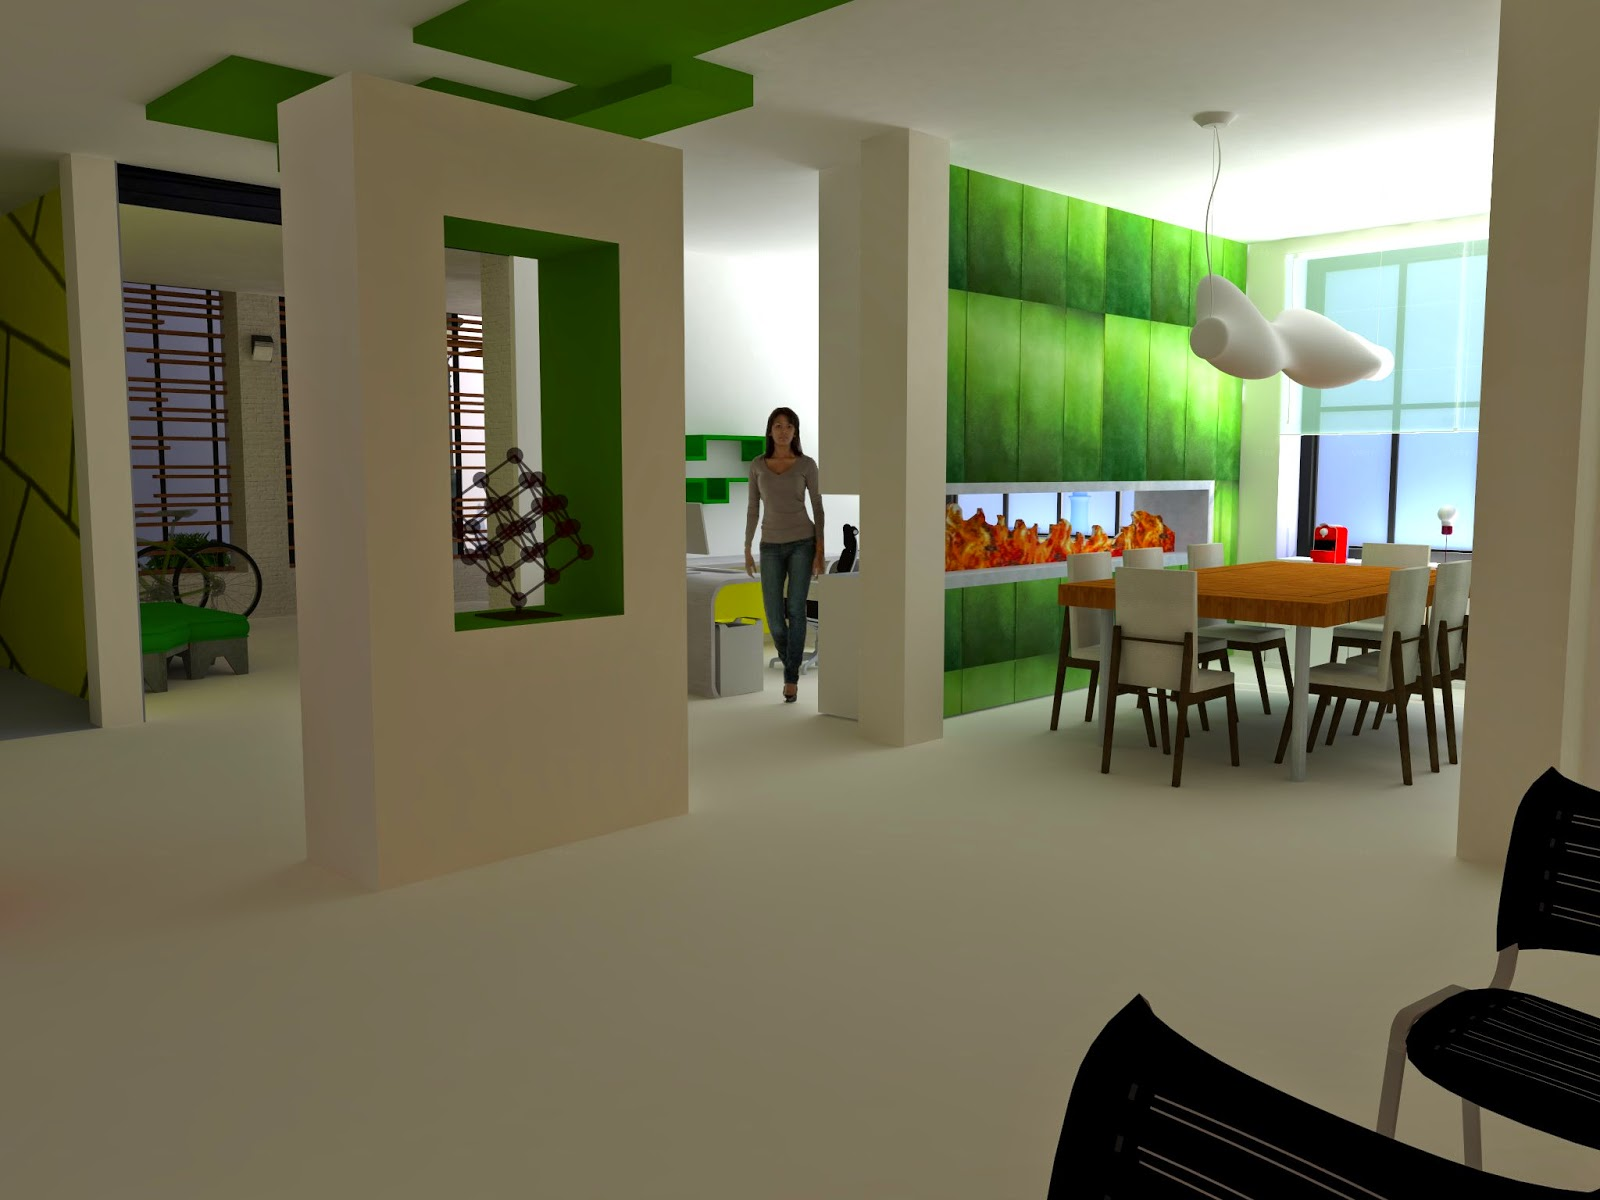 dise o de interiores escuela de arte de motril proyecto On facultad de diseno de interiores